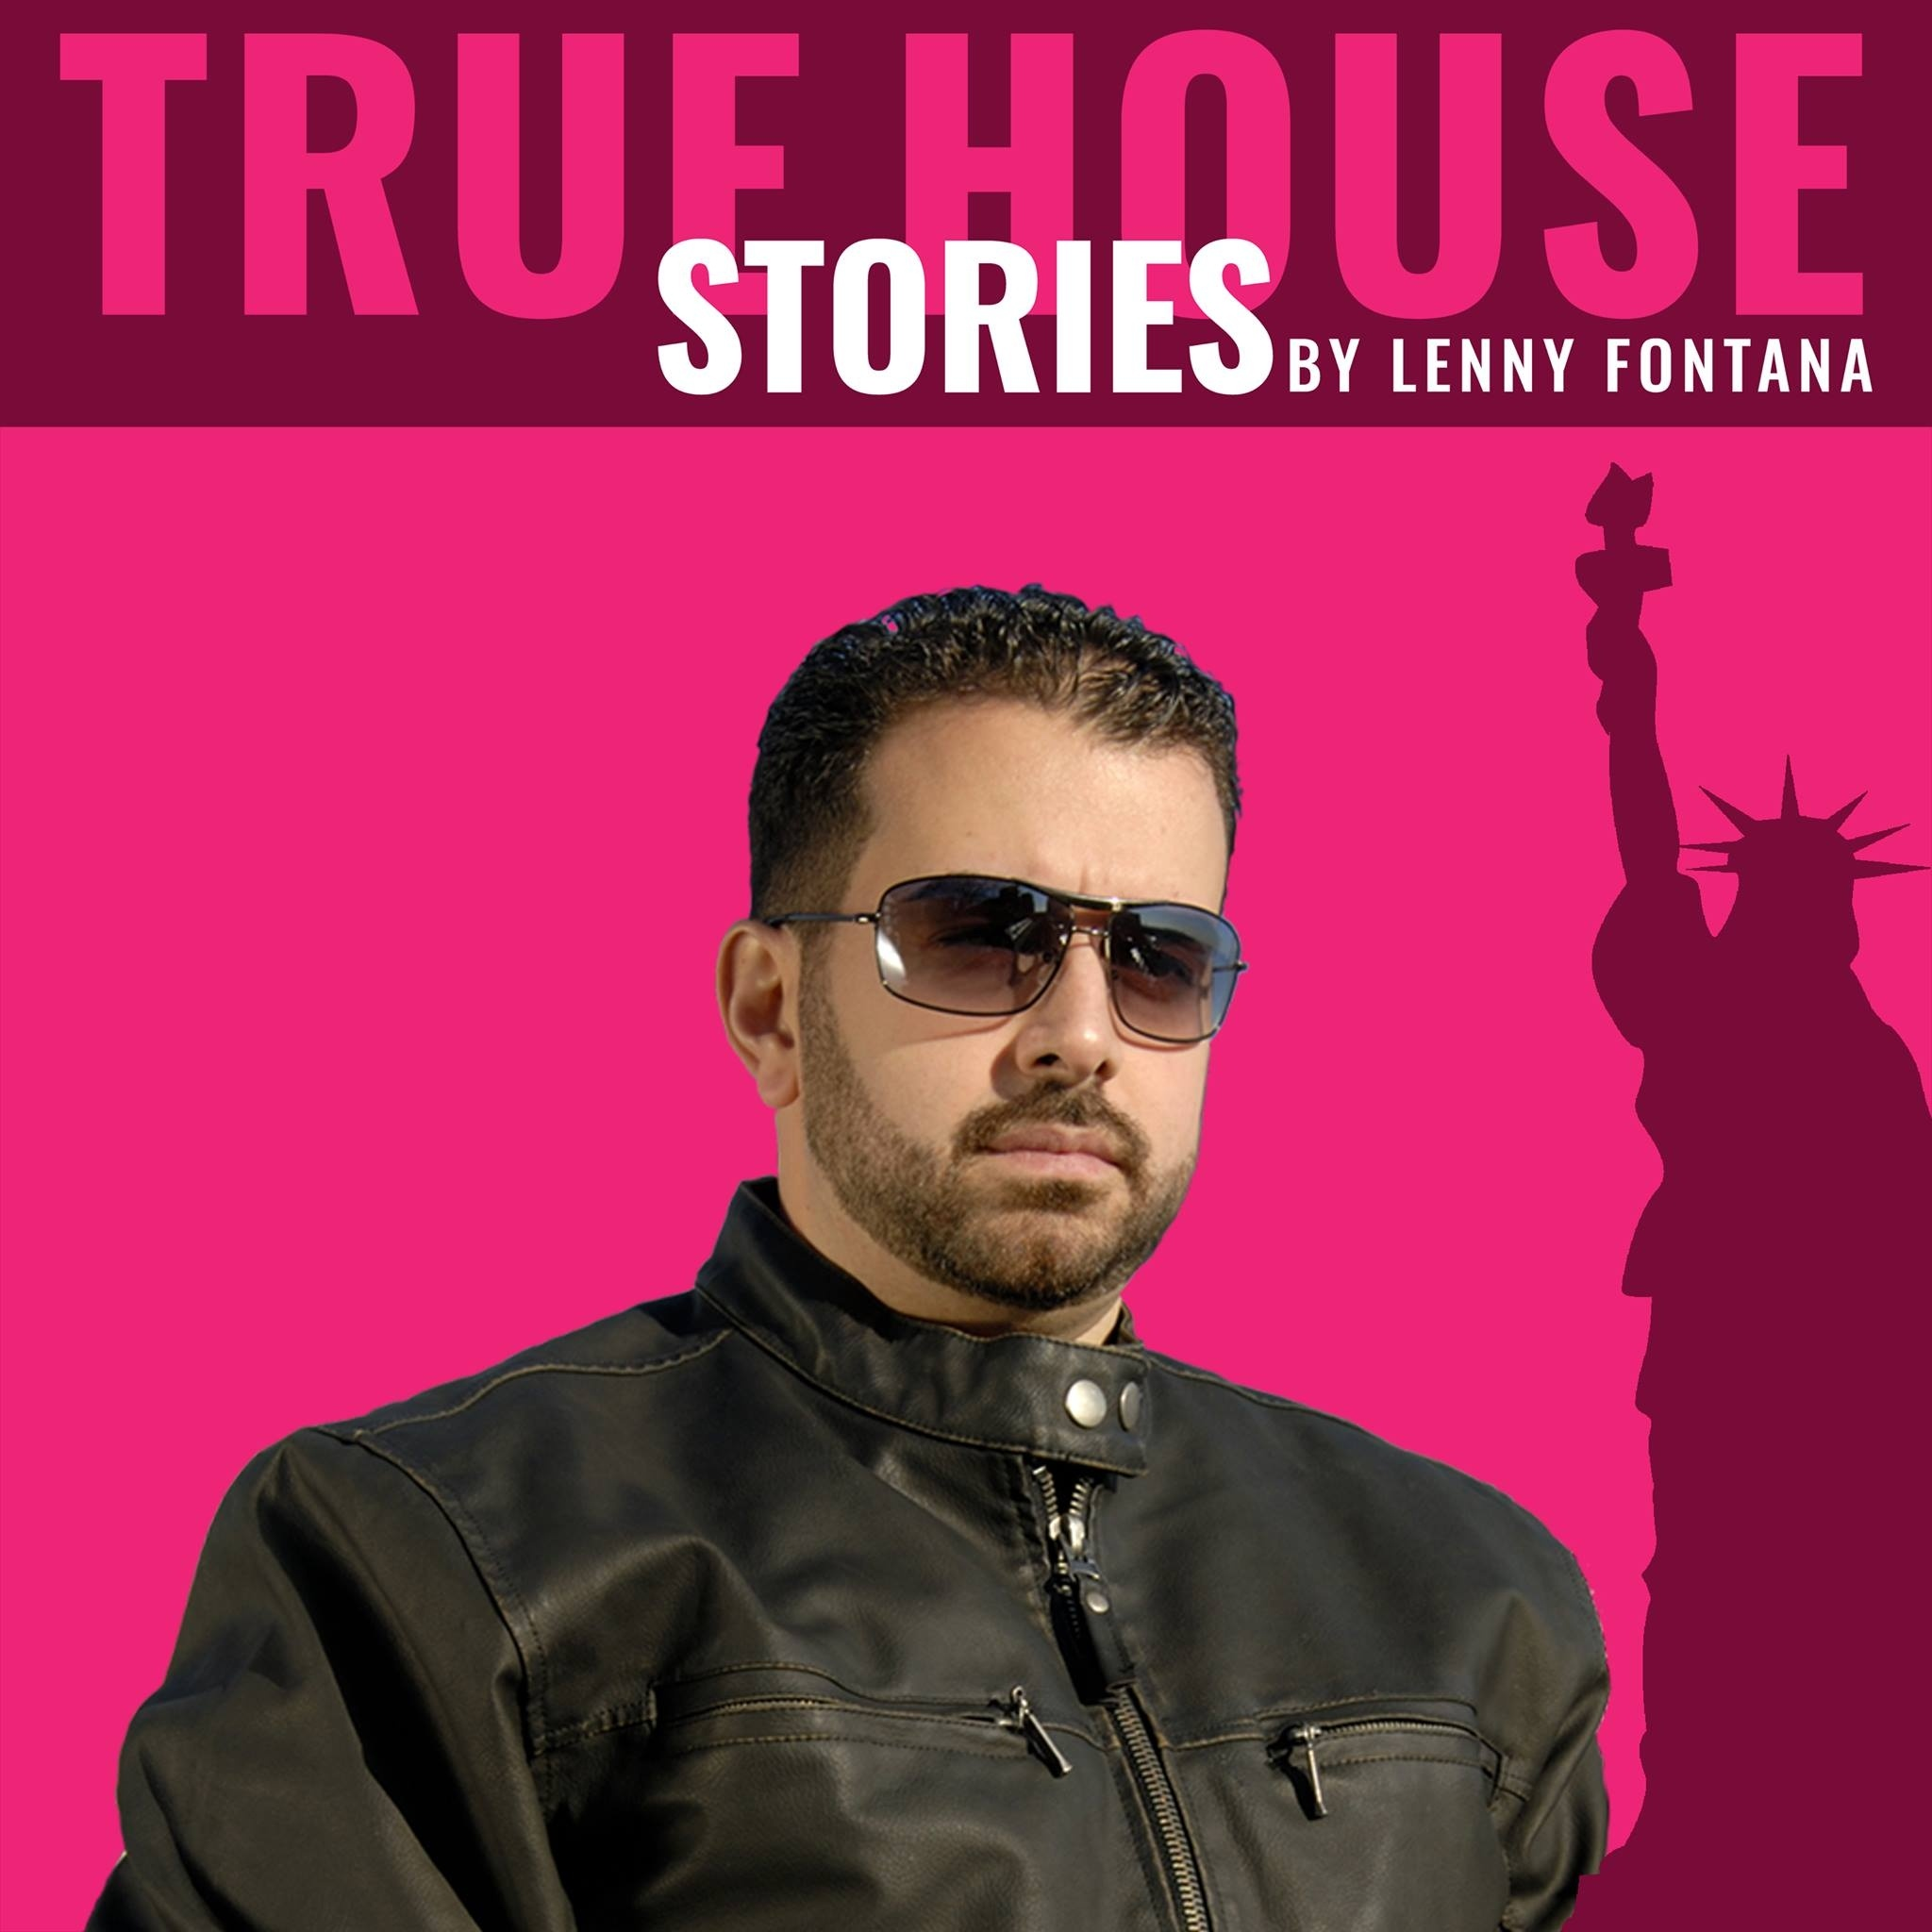 True House Stories Take Over - Host By Lenny Fontana